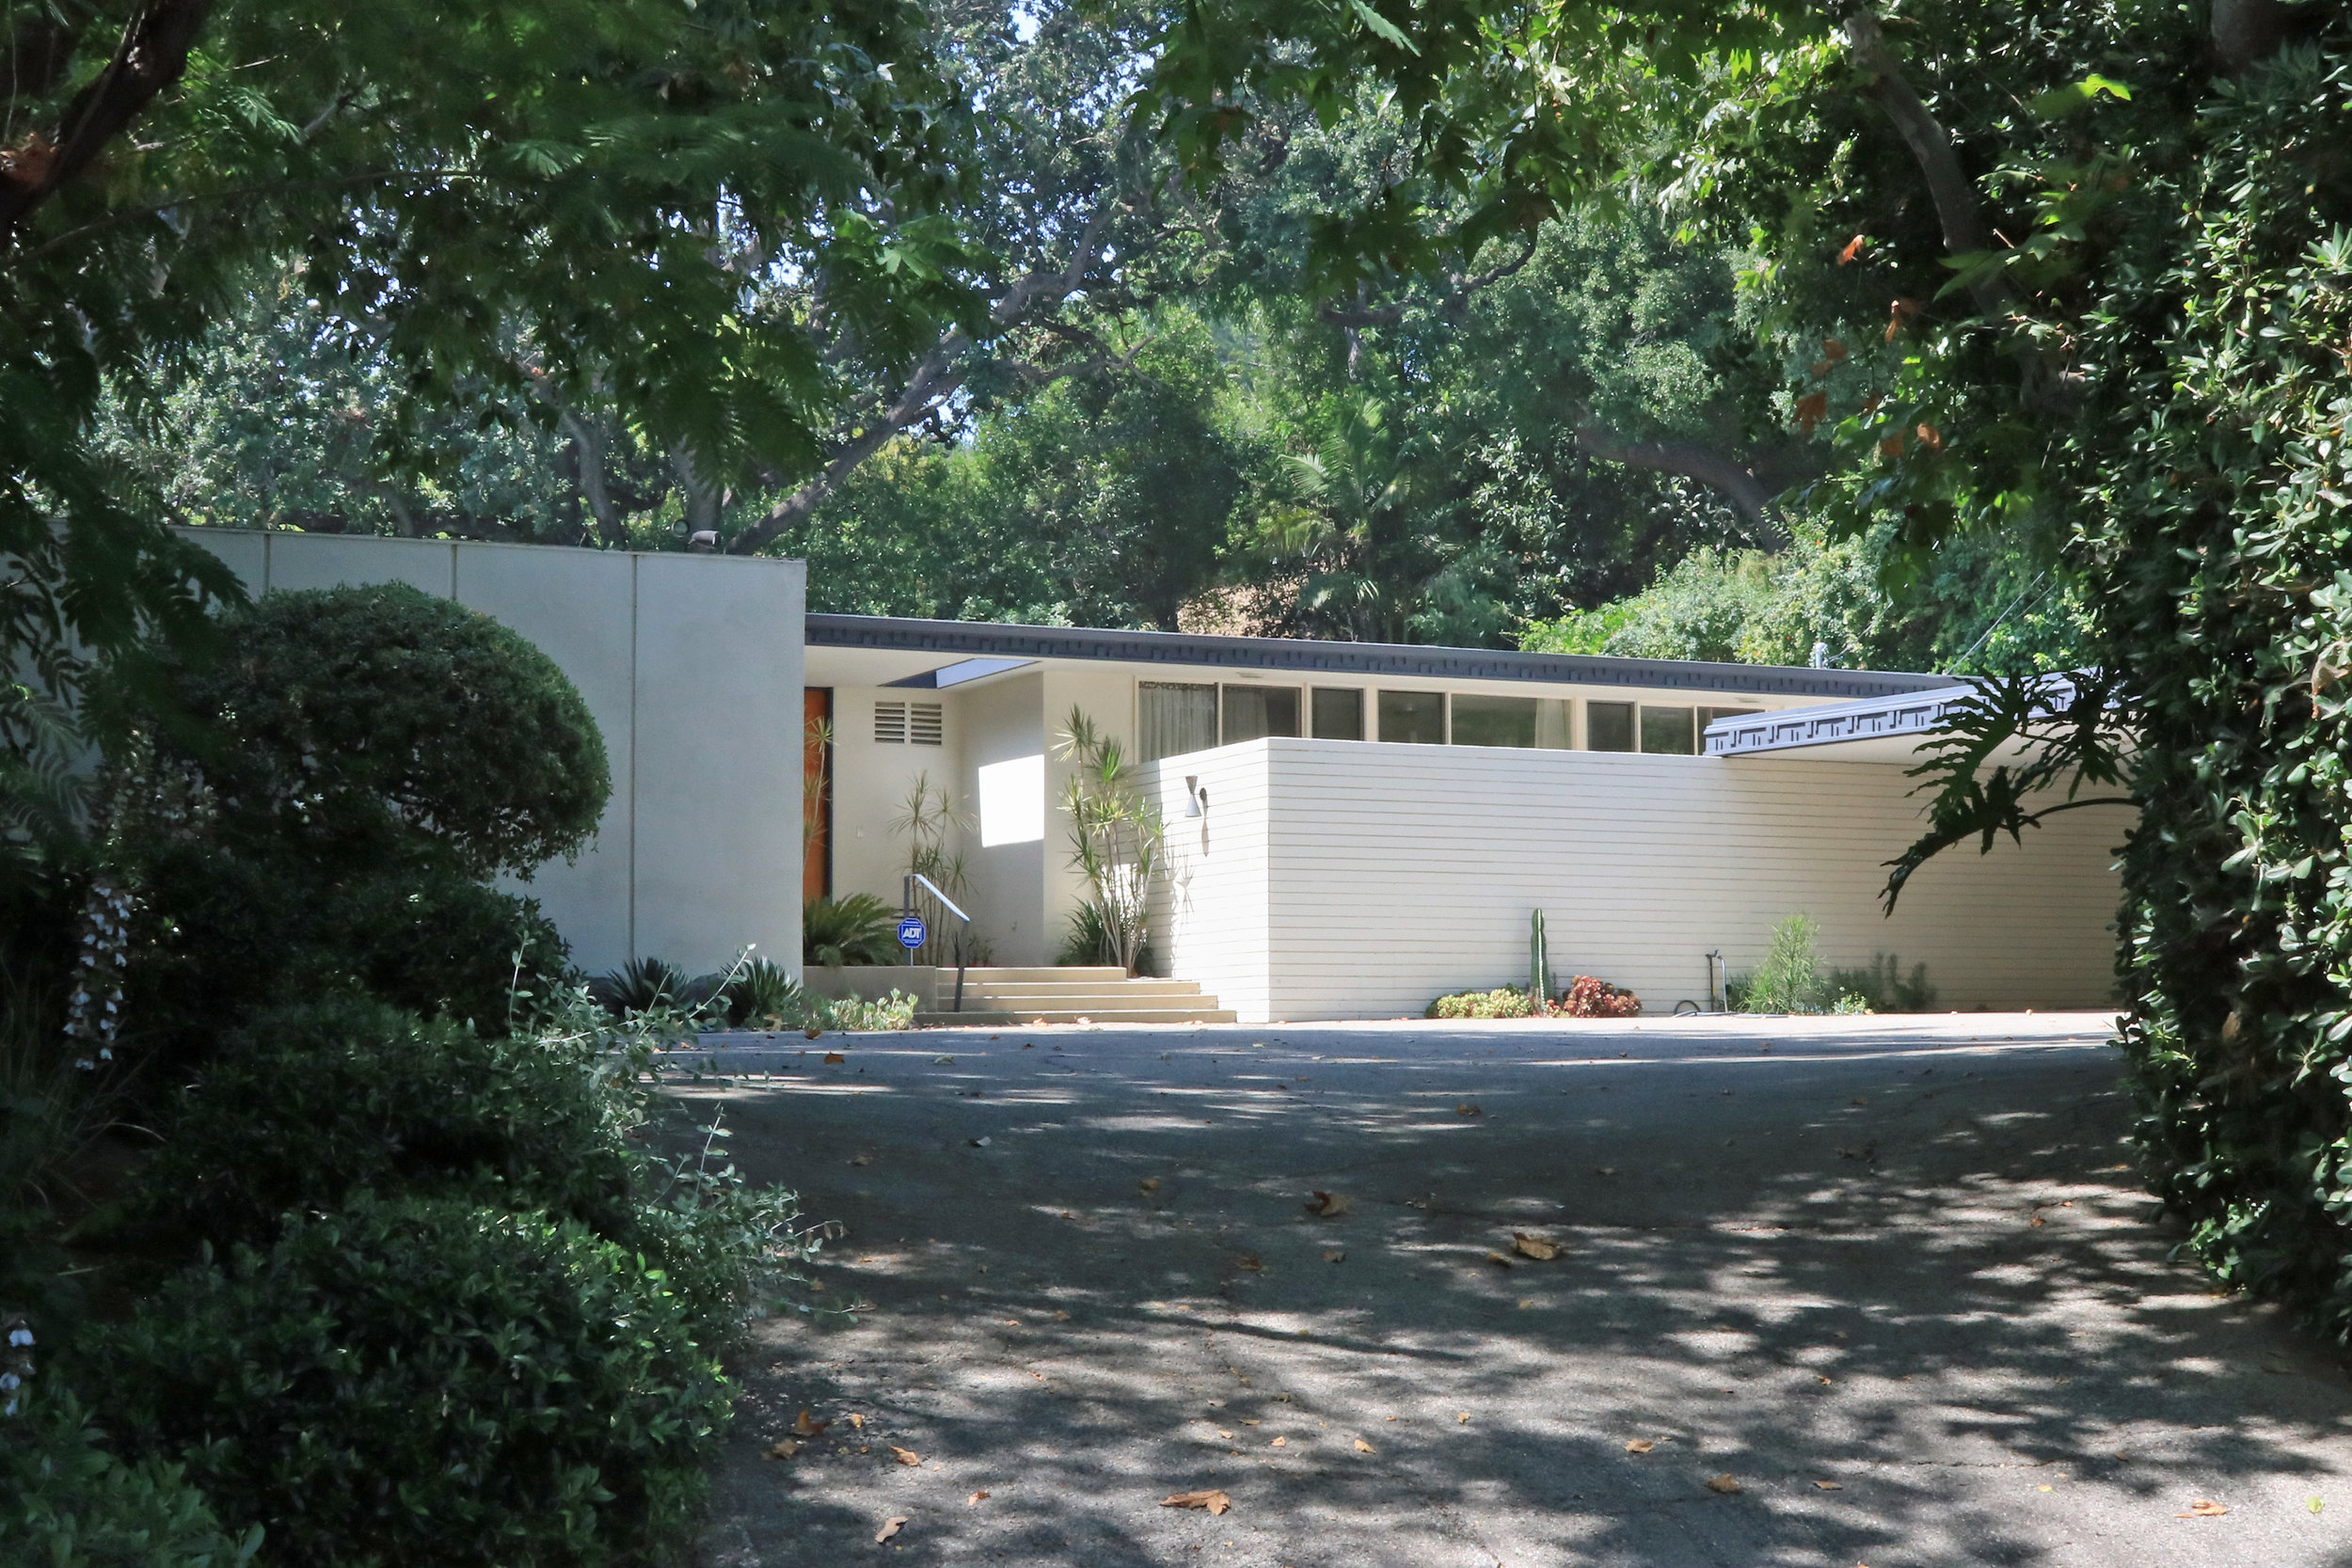 Gattman Residence    Cliff Burlew - 1959